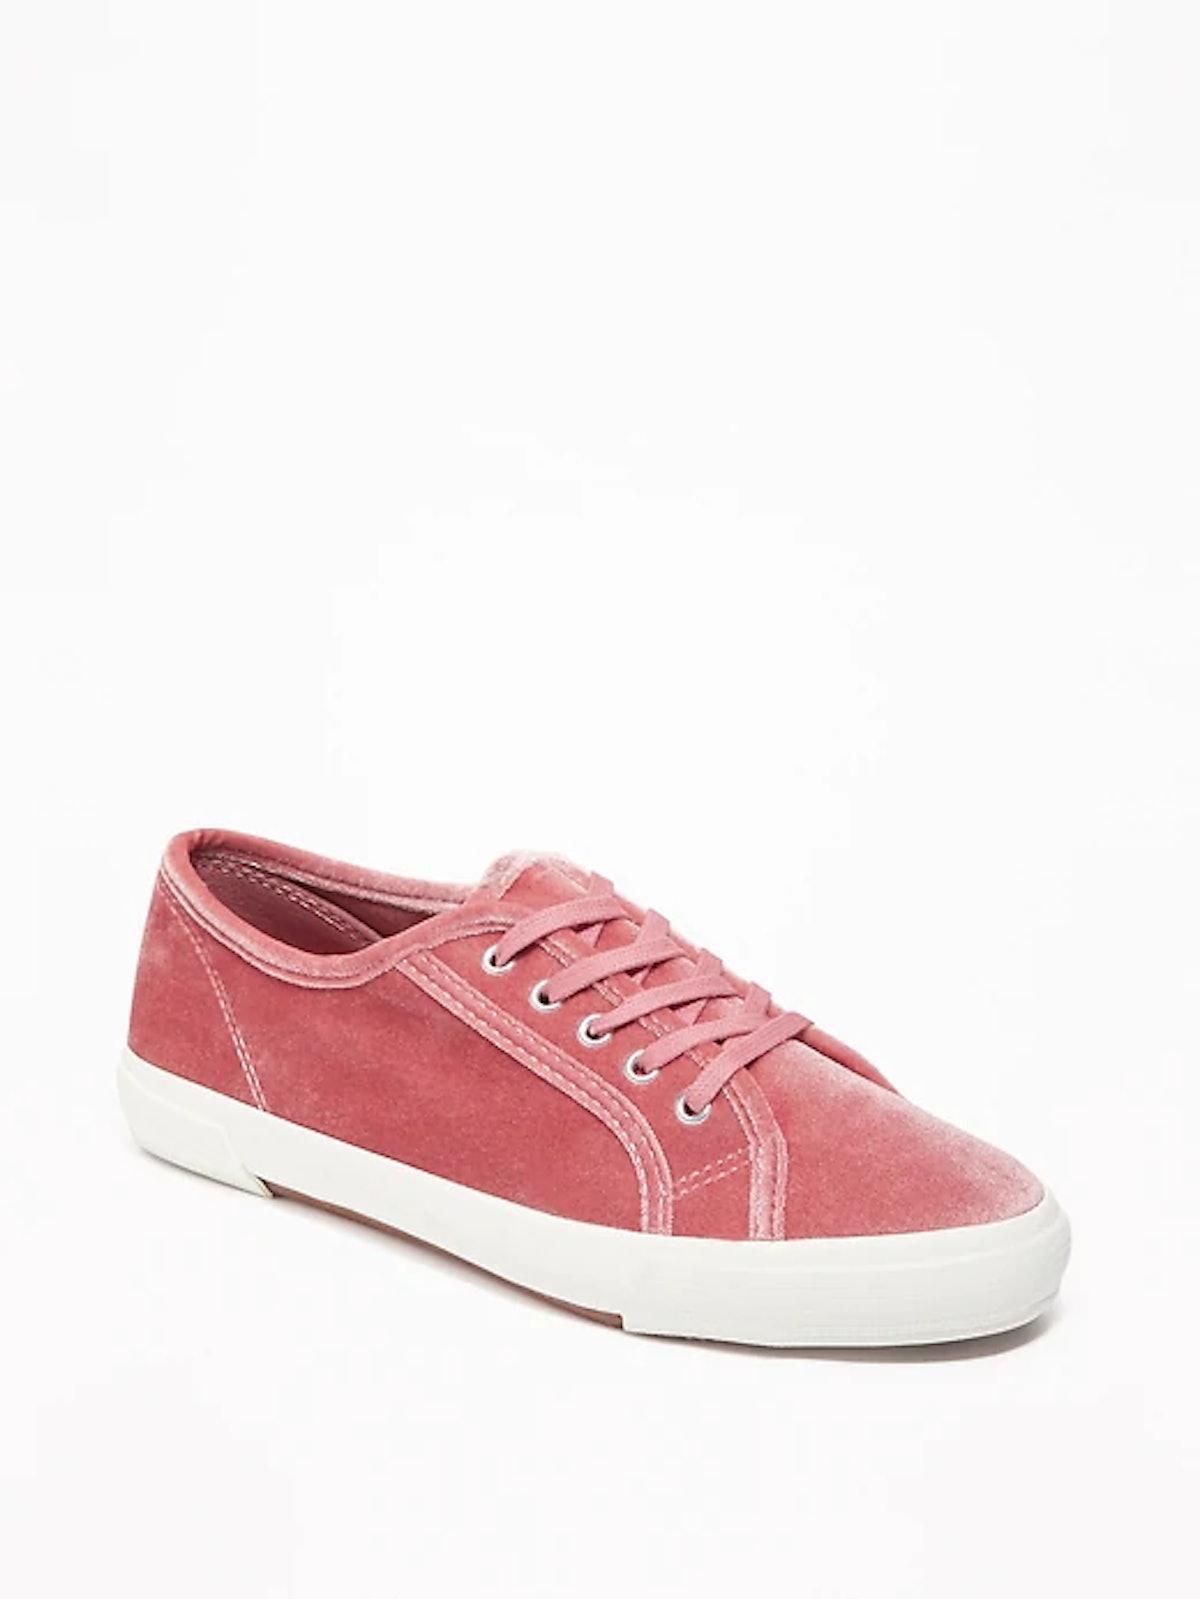 Velvet Lace-Up Sneakers for Women